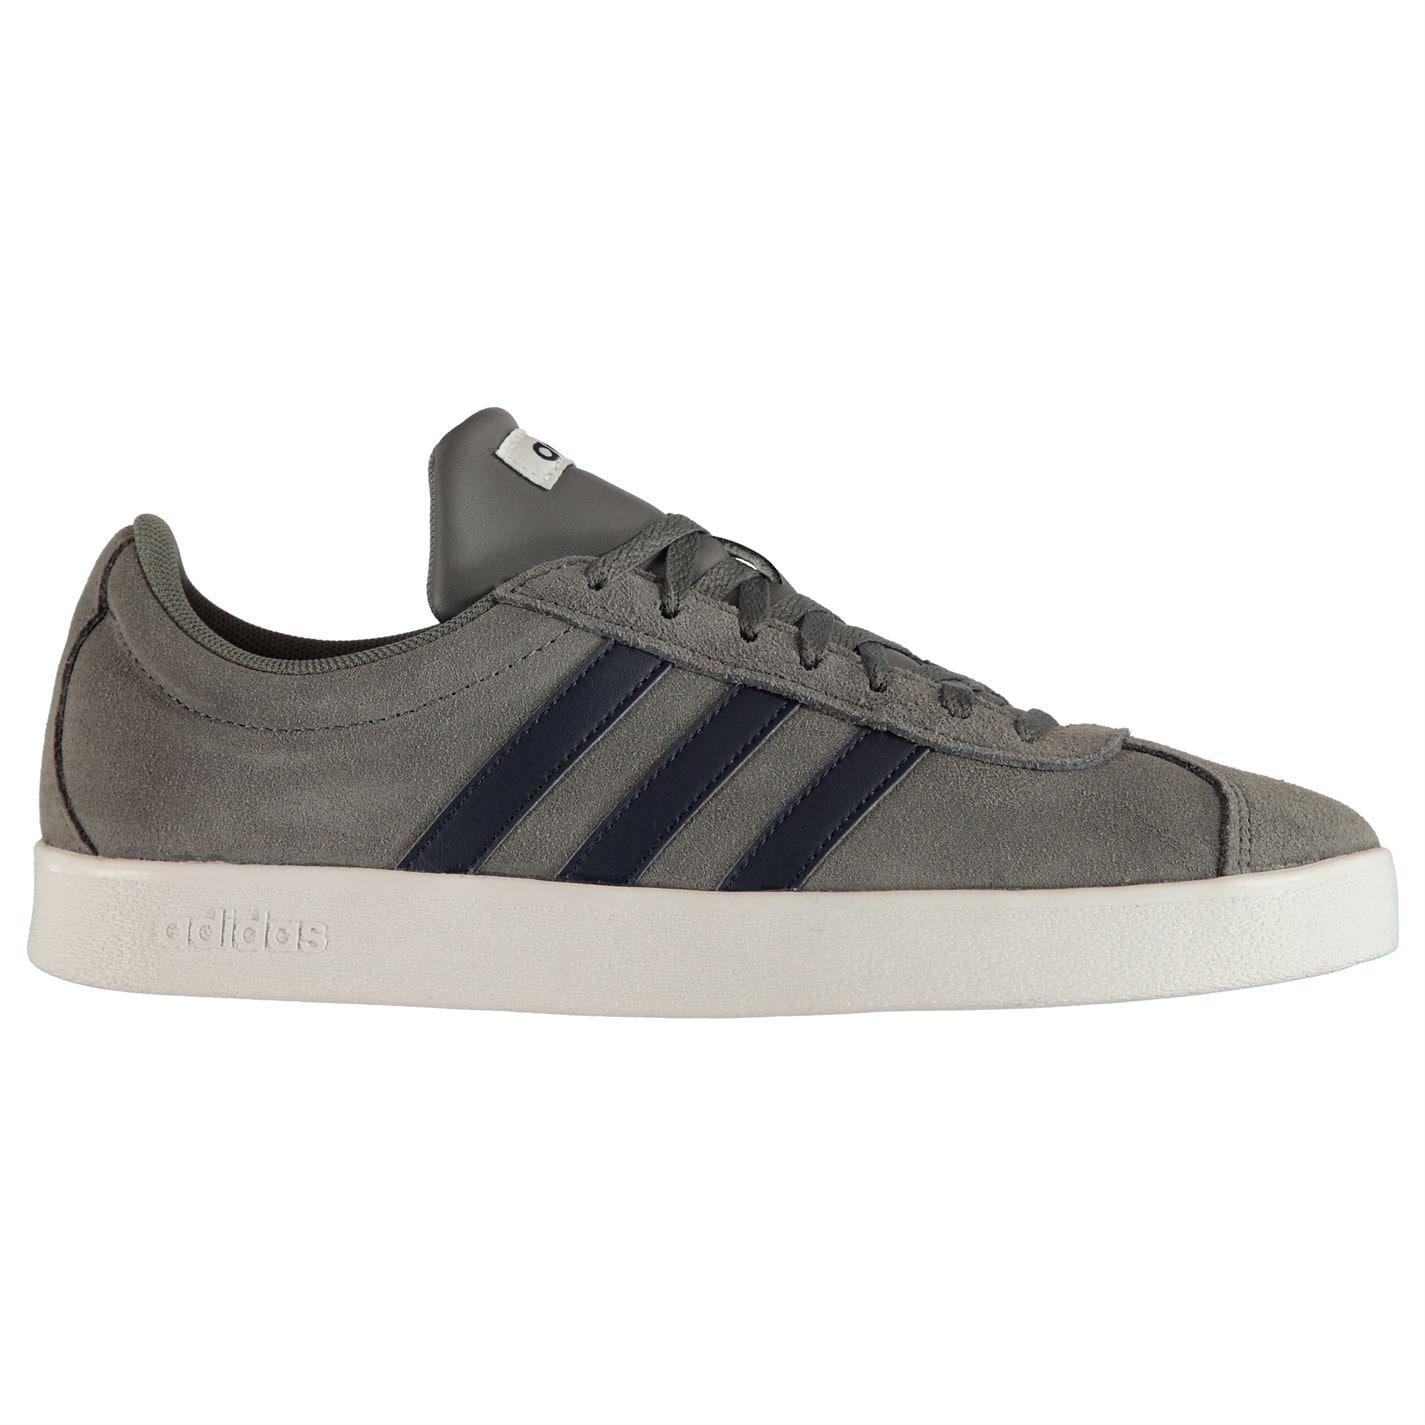 Adidas VL Court 2 Suede Pánská obuv 16303802 9 (43.3)